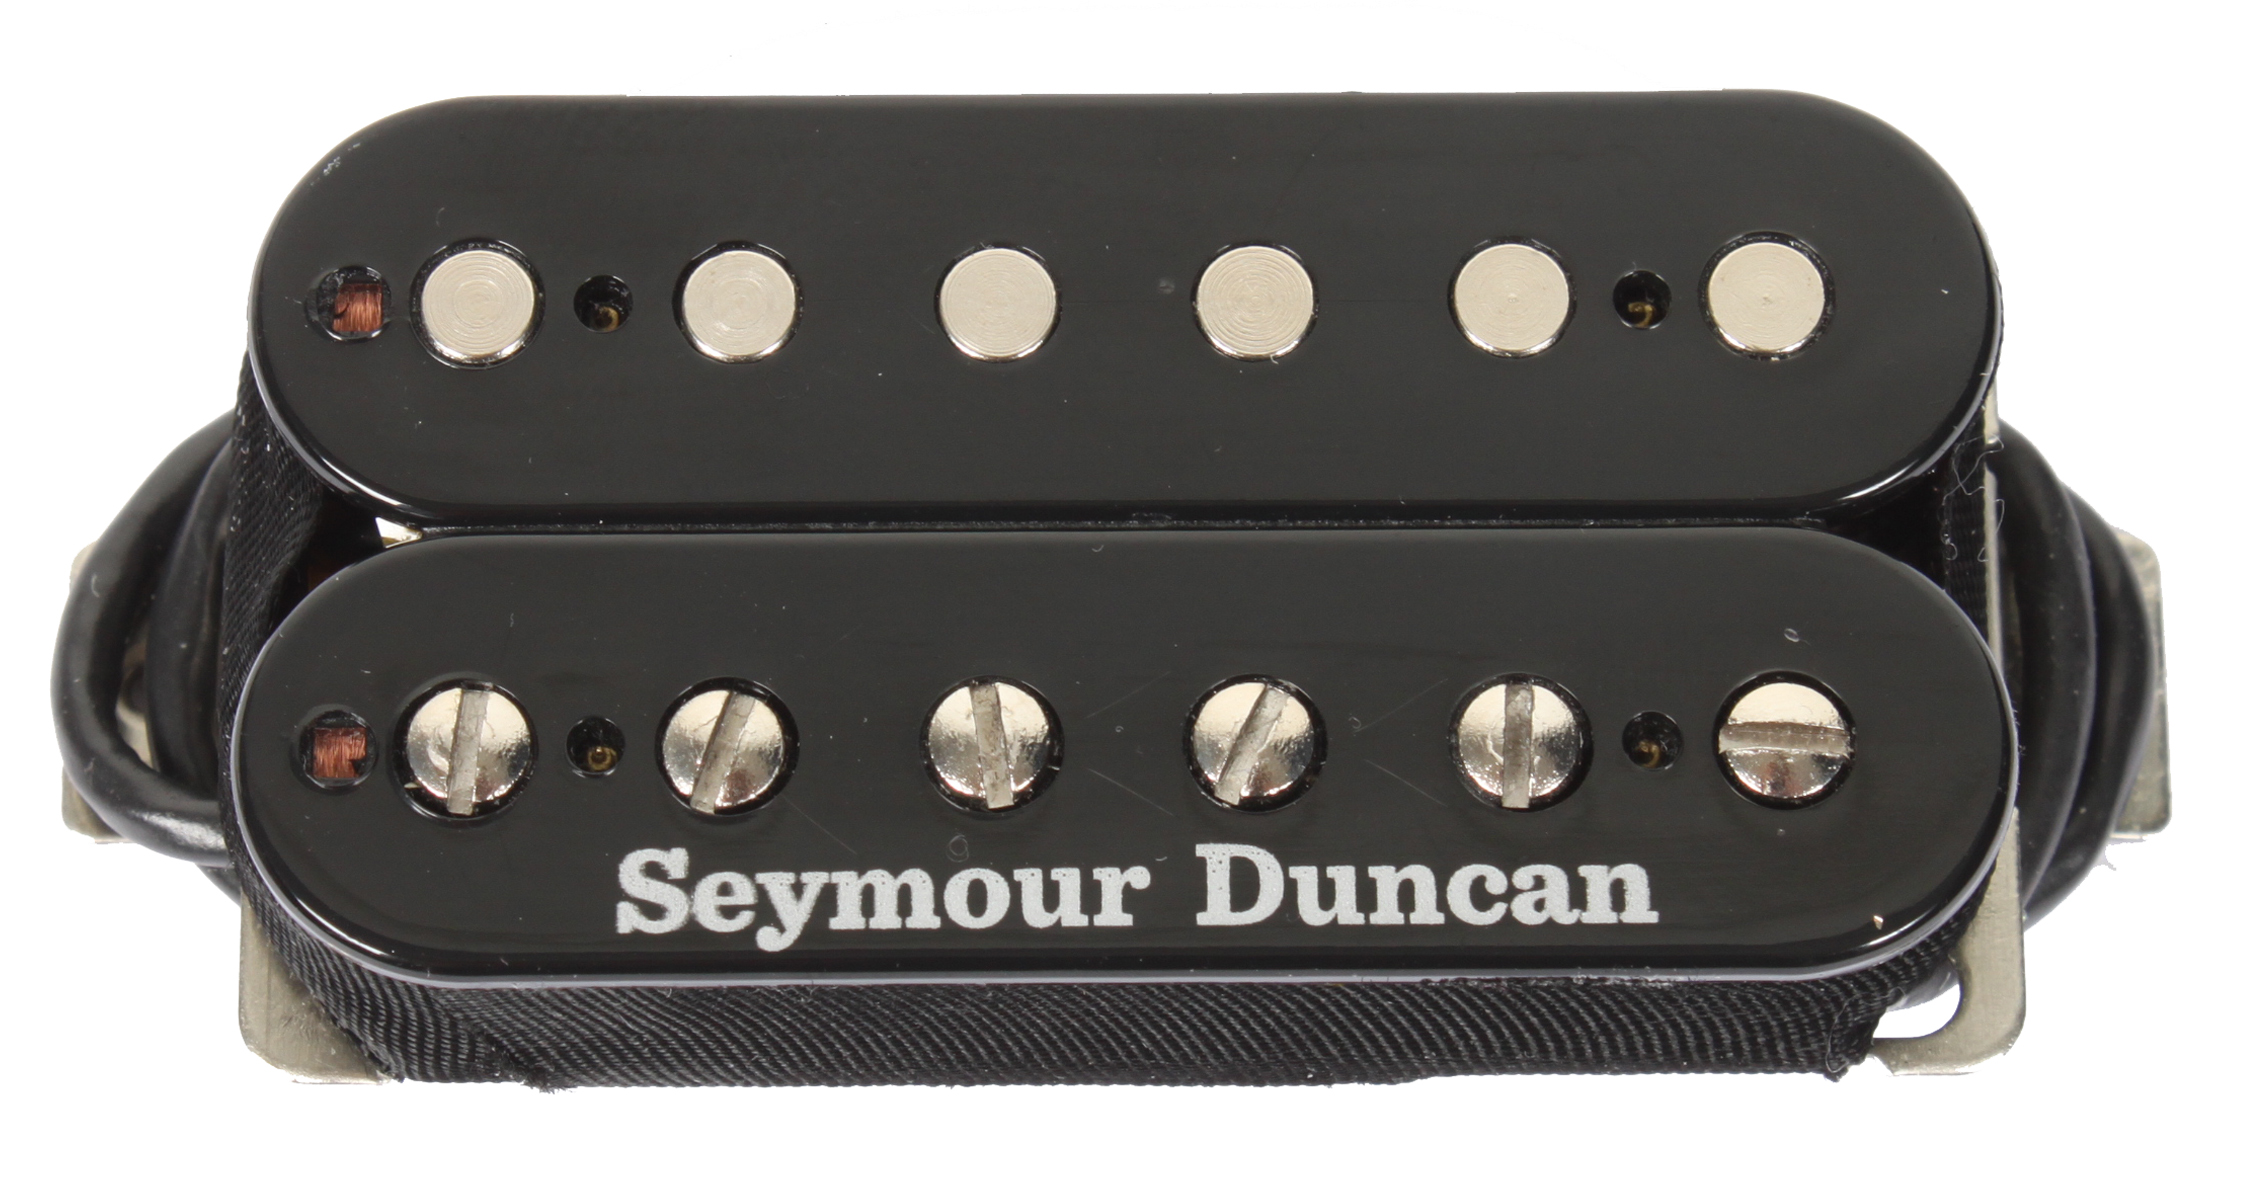 Tolle Seymour Duncan Telecaster Verkabelung Fotos - Elektrische ...